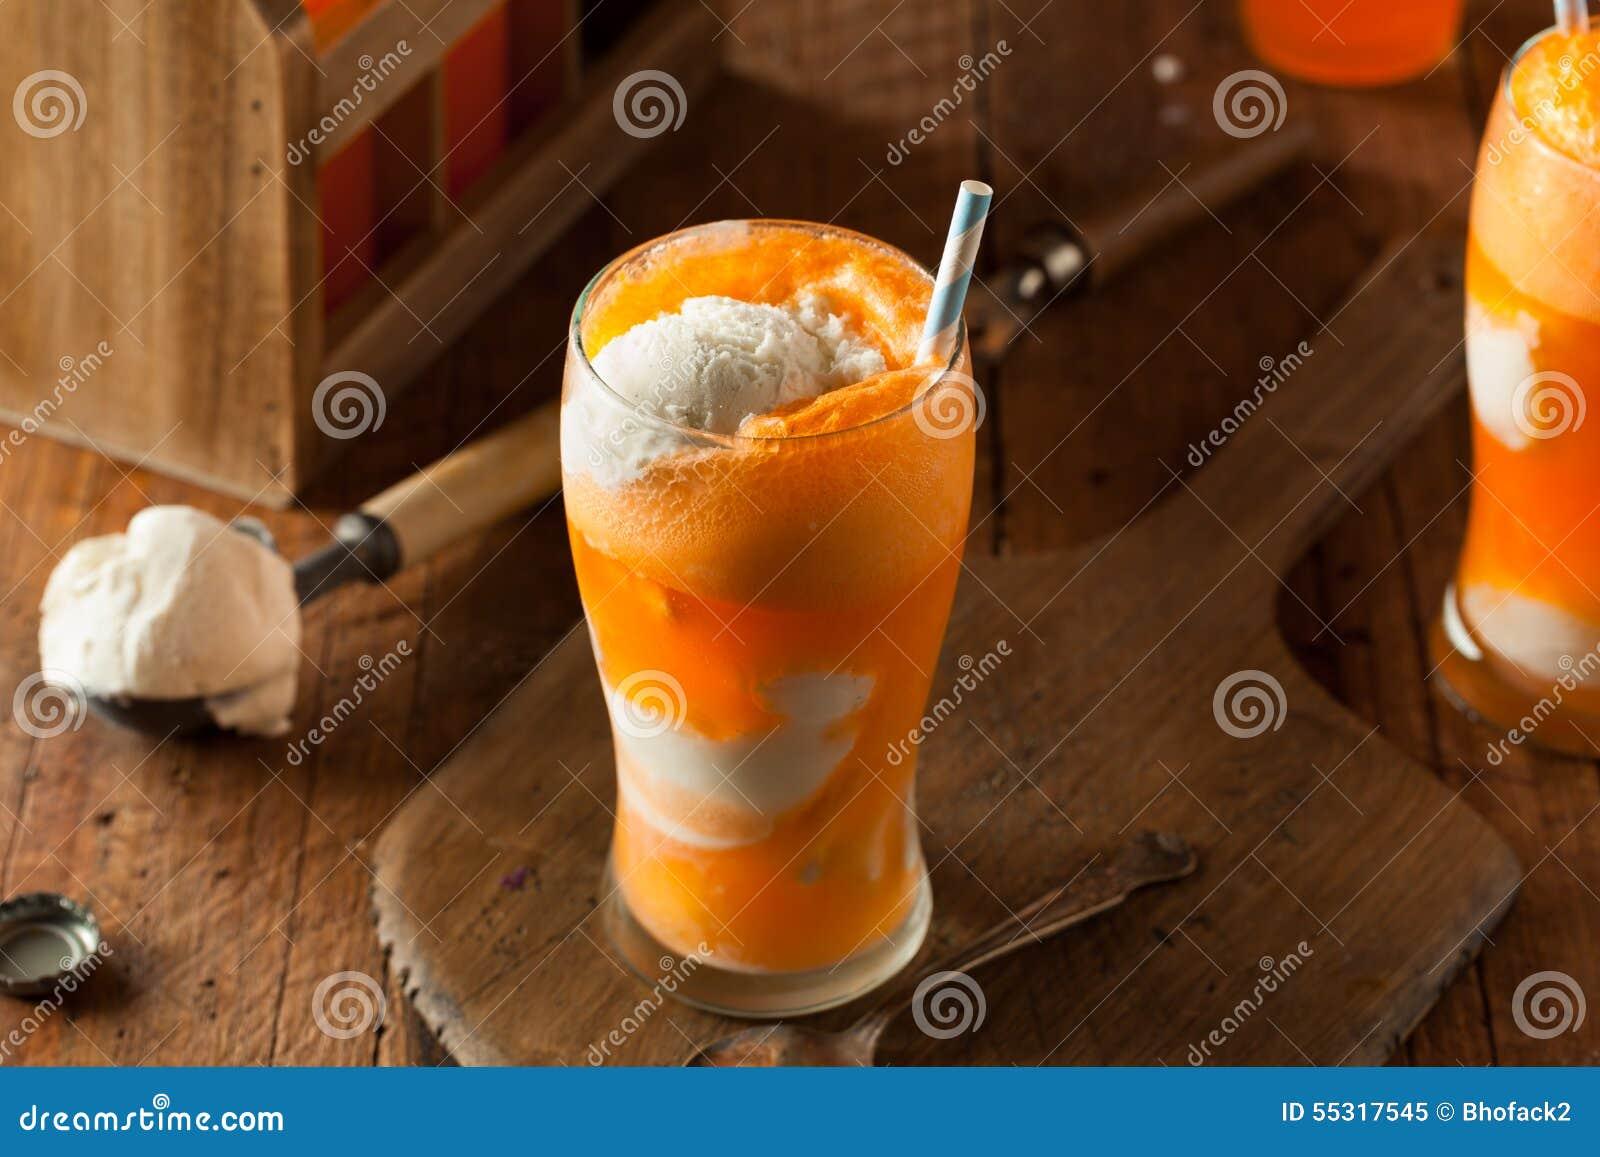 Orange Soda Creamsicle Ice Cream Float Stock Photo - Image: 55317545